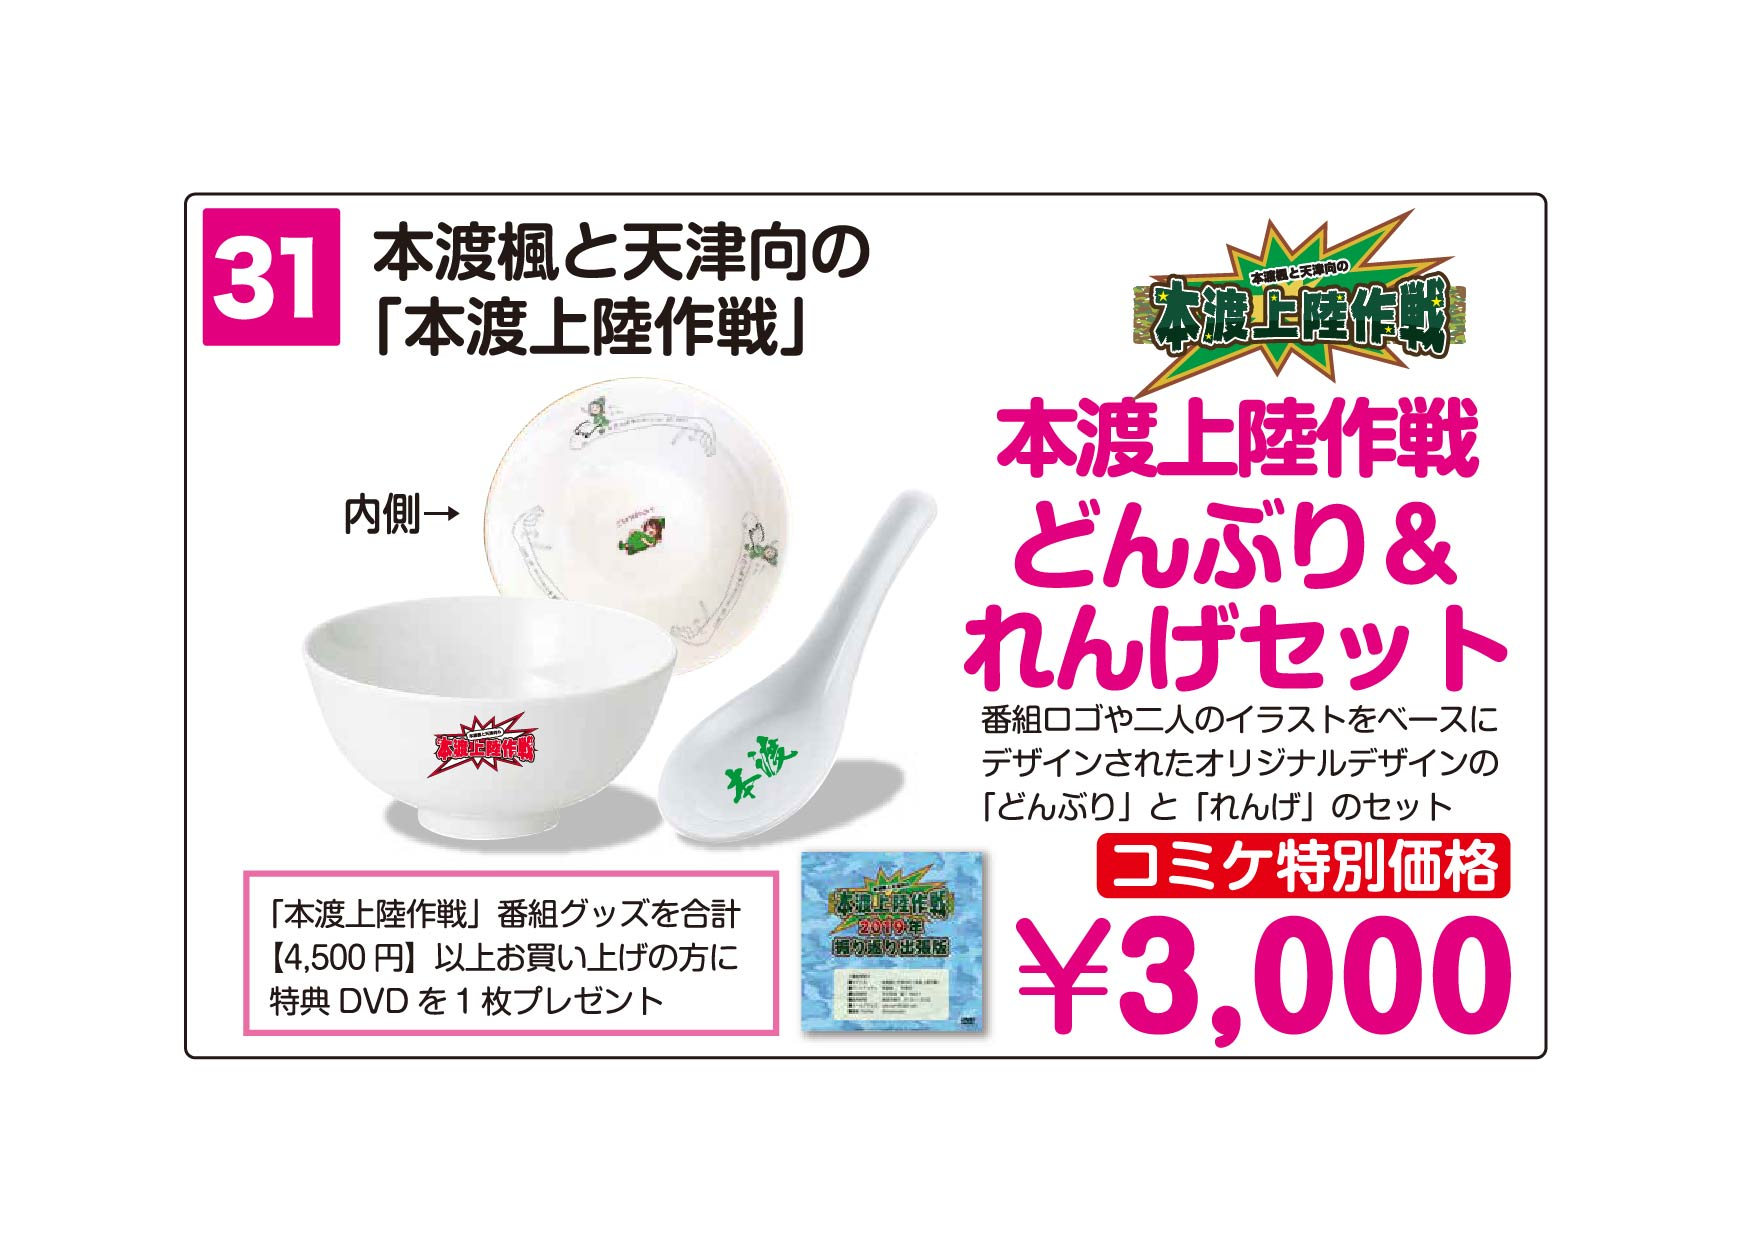 http://www.joqr.co.jp/AandG_booth/31.jpg